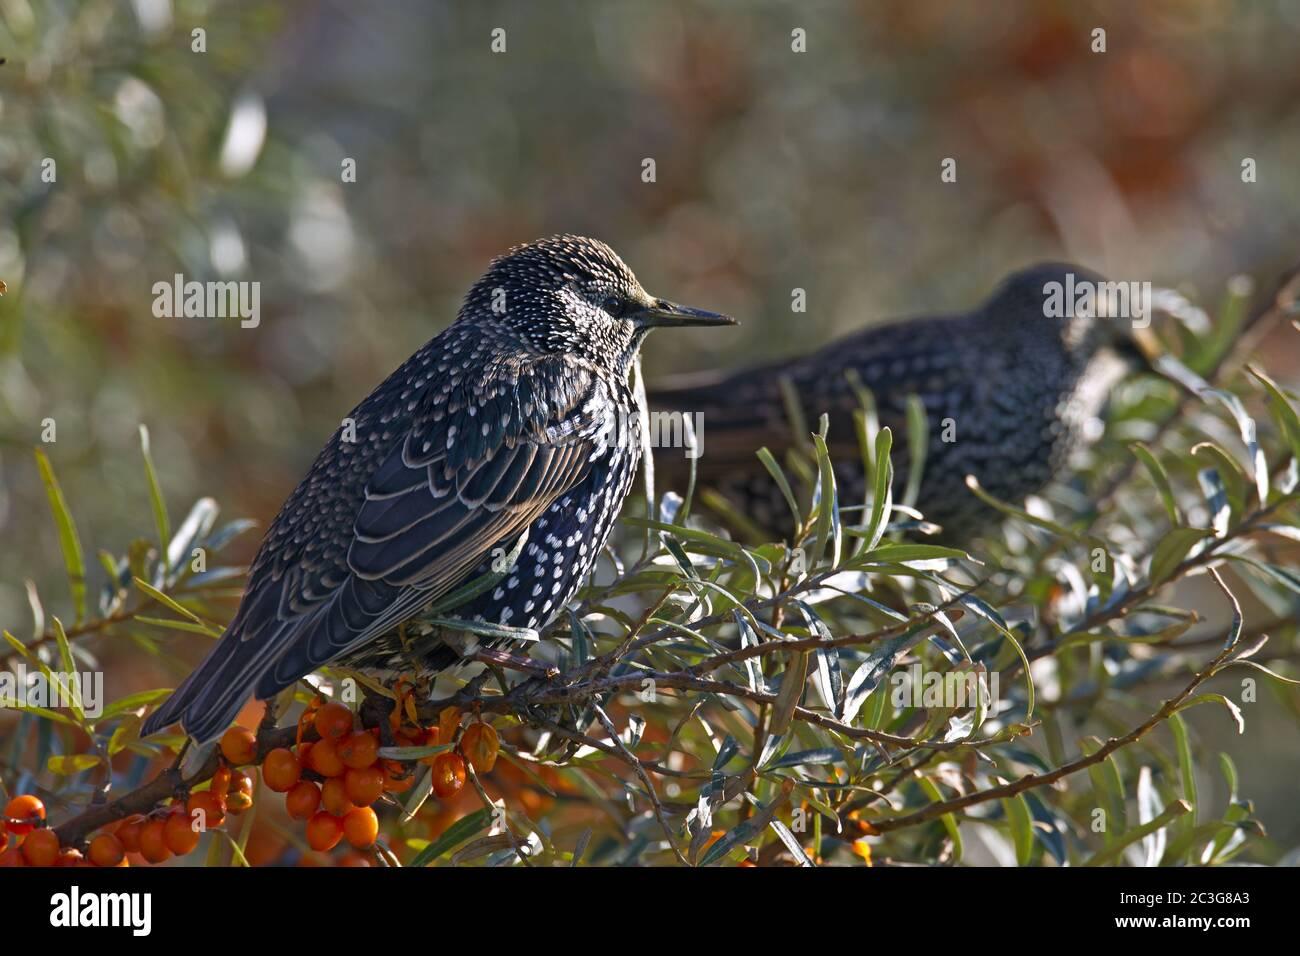 Common Starling - Starling adults in basic plumage / Sturnus vulgaris  -  Hippophae rhamnoides Stock Photo